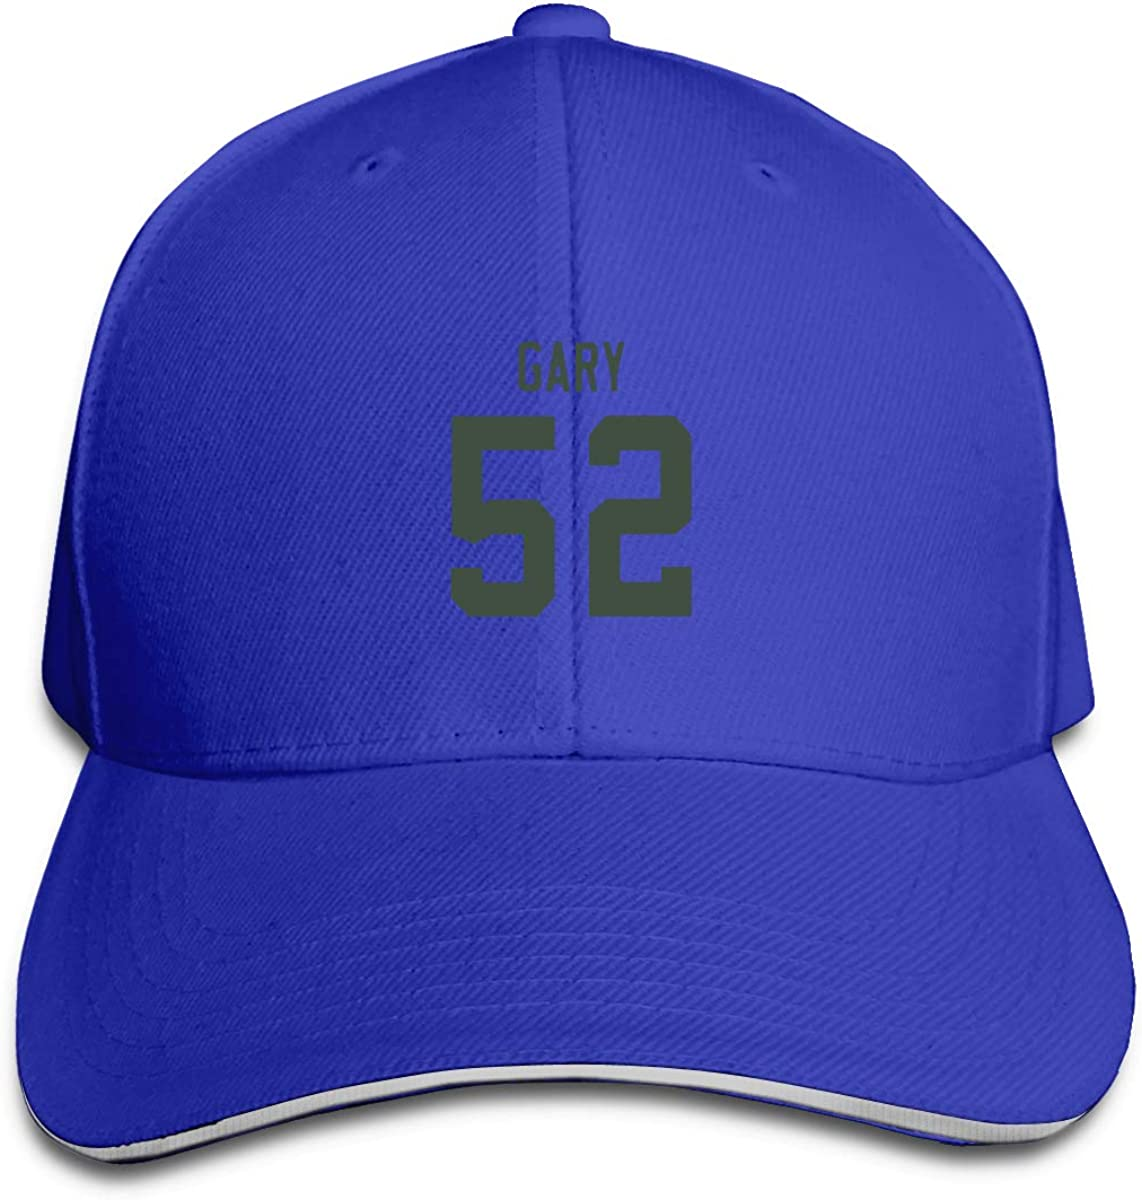 Haggai Romeo Unisex Football Rashan-Gary Snapback Baseball Cap Flat Brim Hip Hop Hat Adjustable Dad Hat